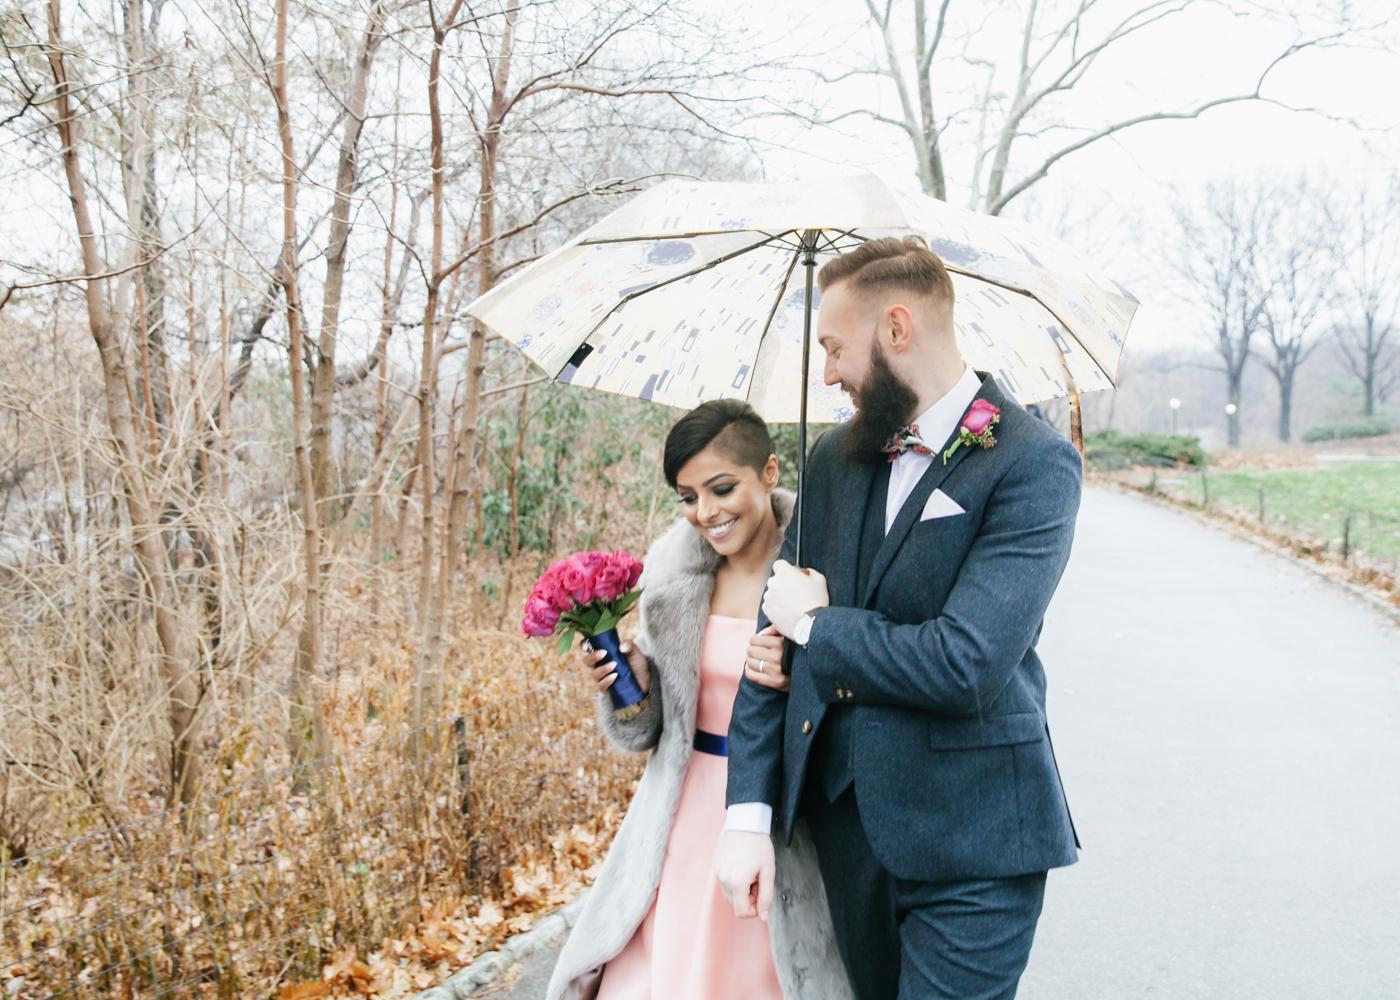 Central-park-wedding-by-Tanya-Isaeva-67.jpg